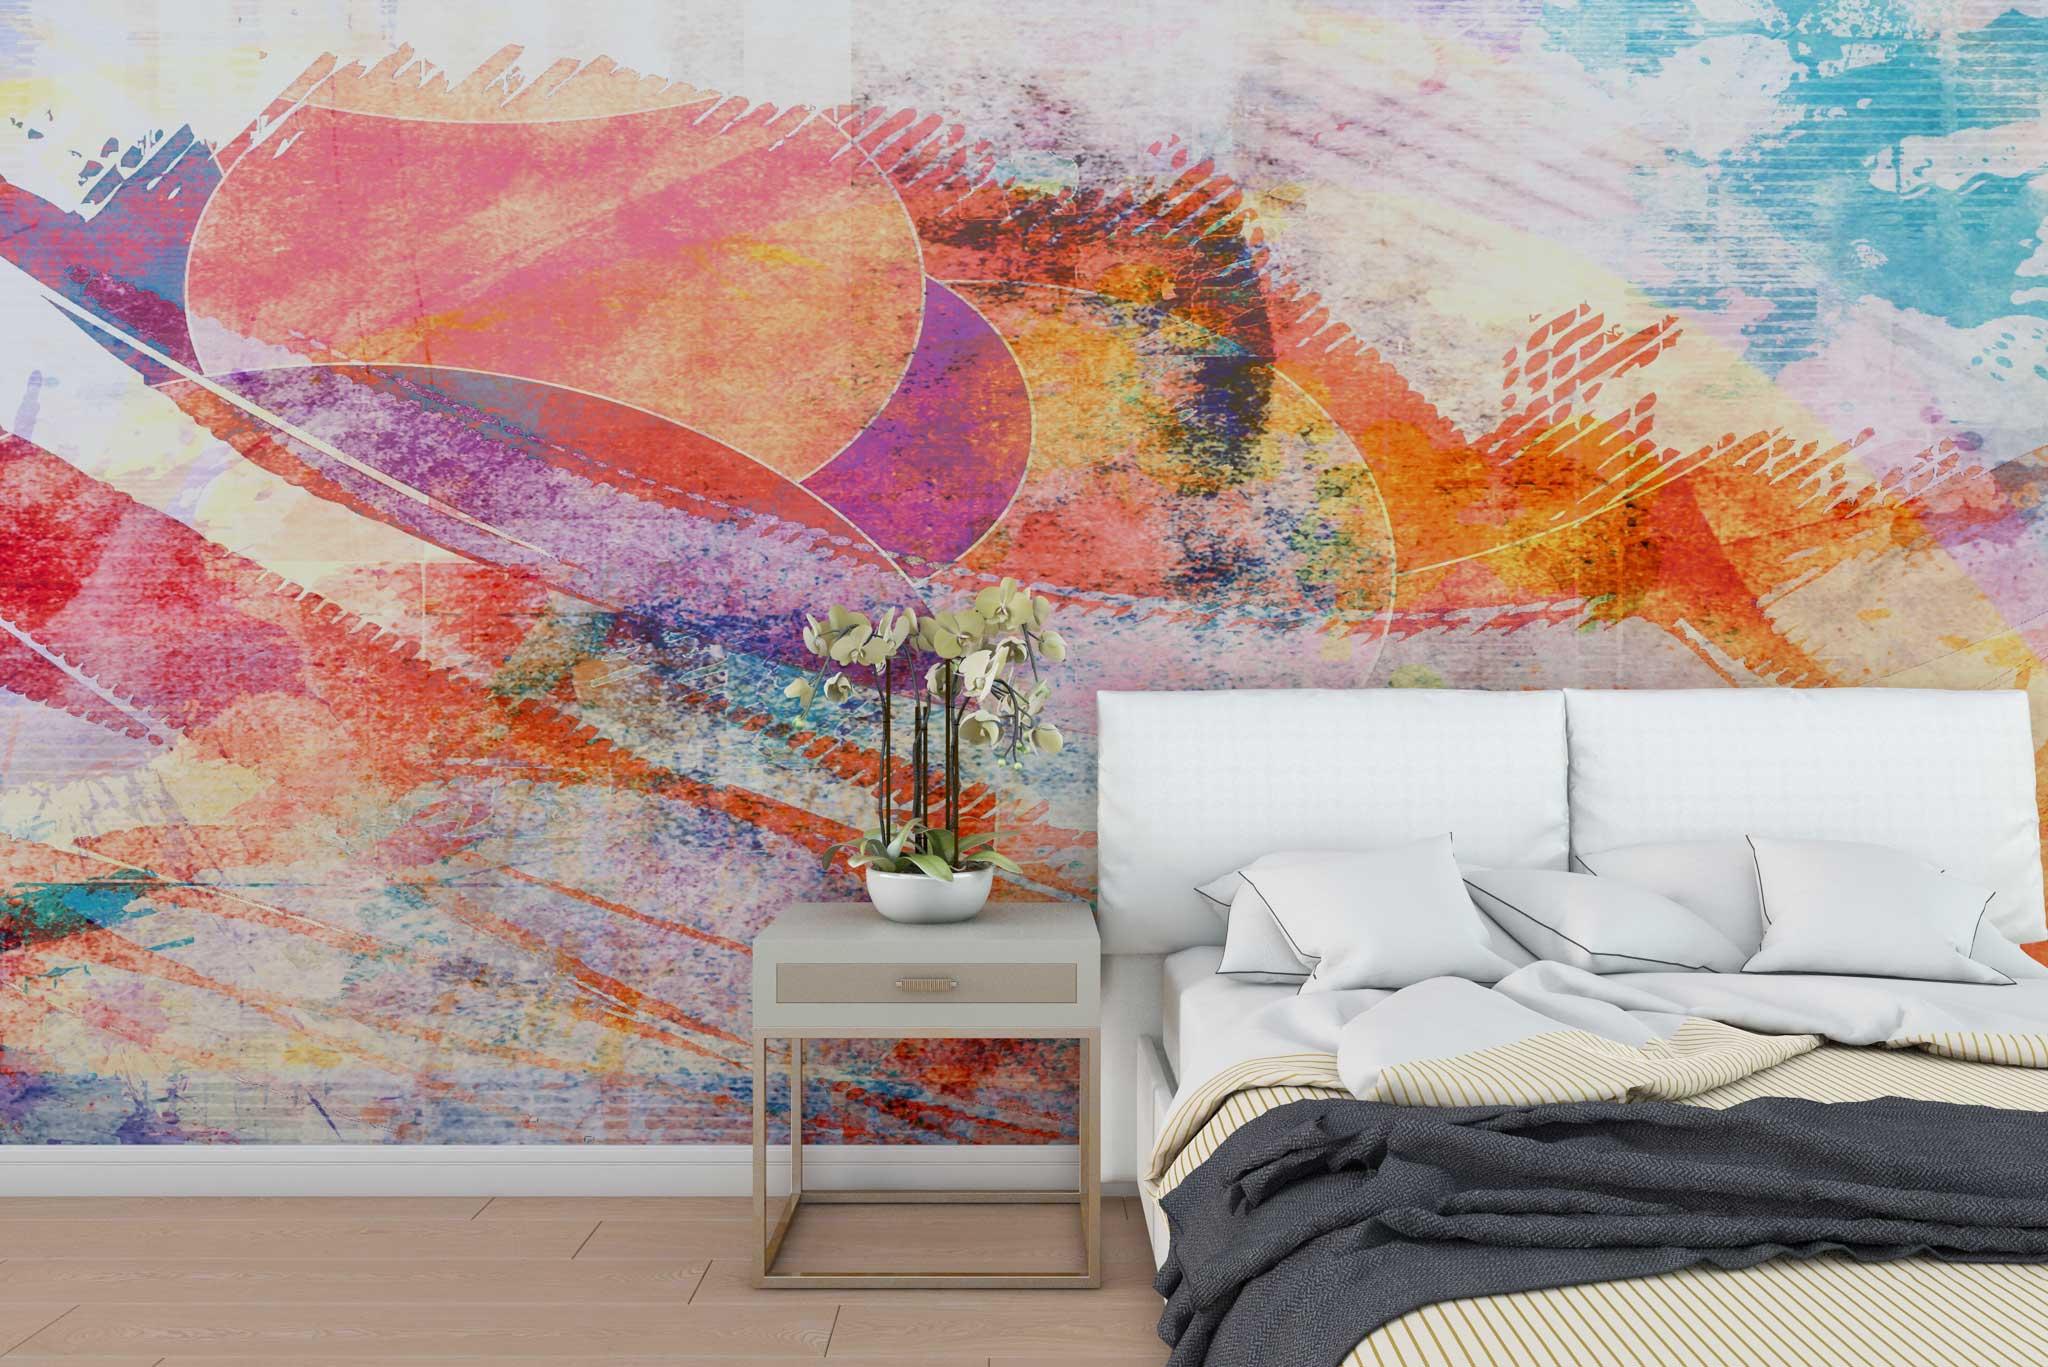 tapet-fototapet-bucuresti-comanda-personalizat-perete-lux--model-abstract-geometric-multicolor